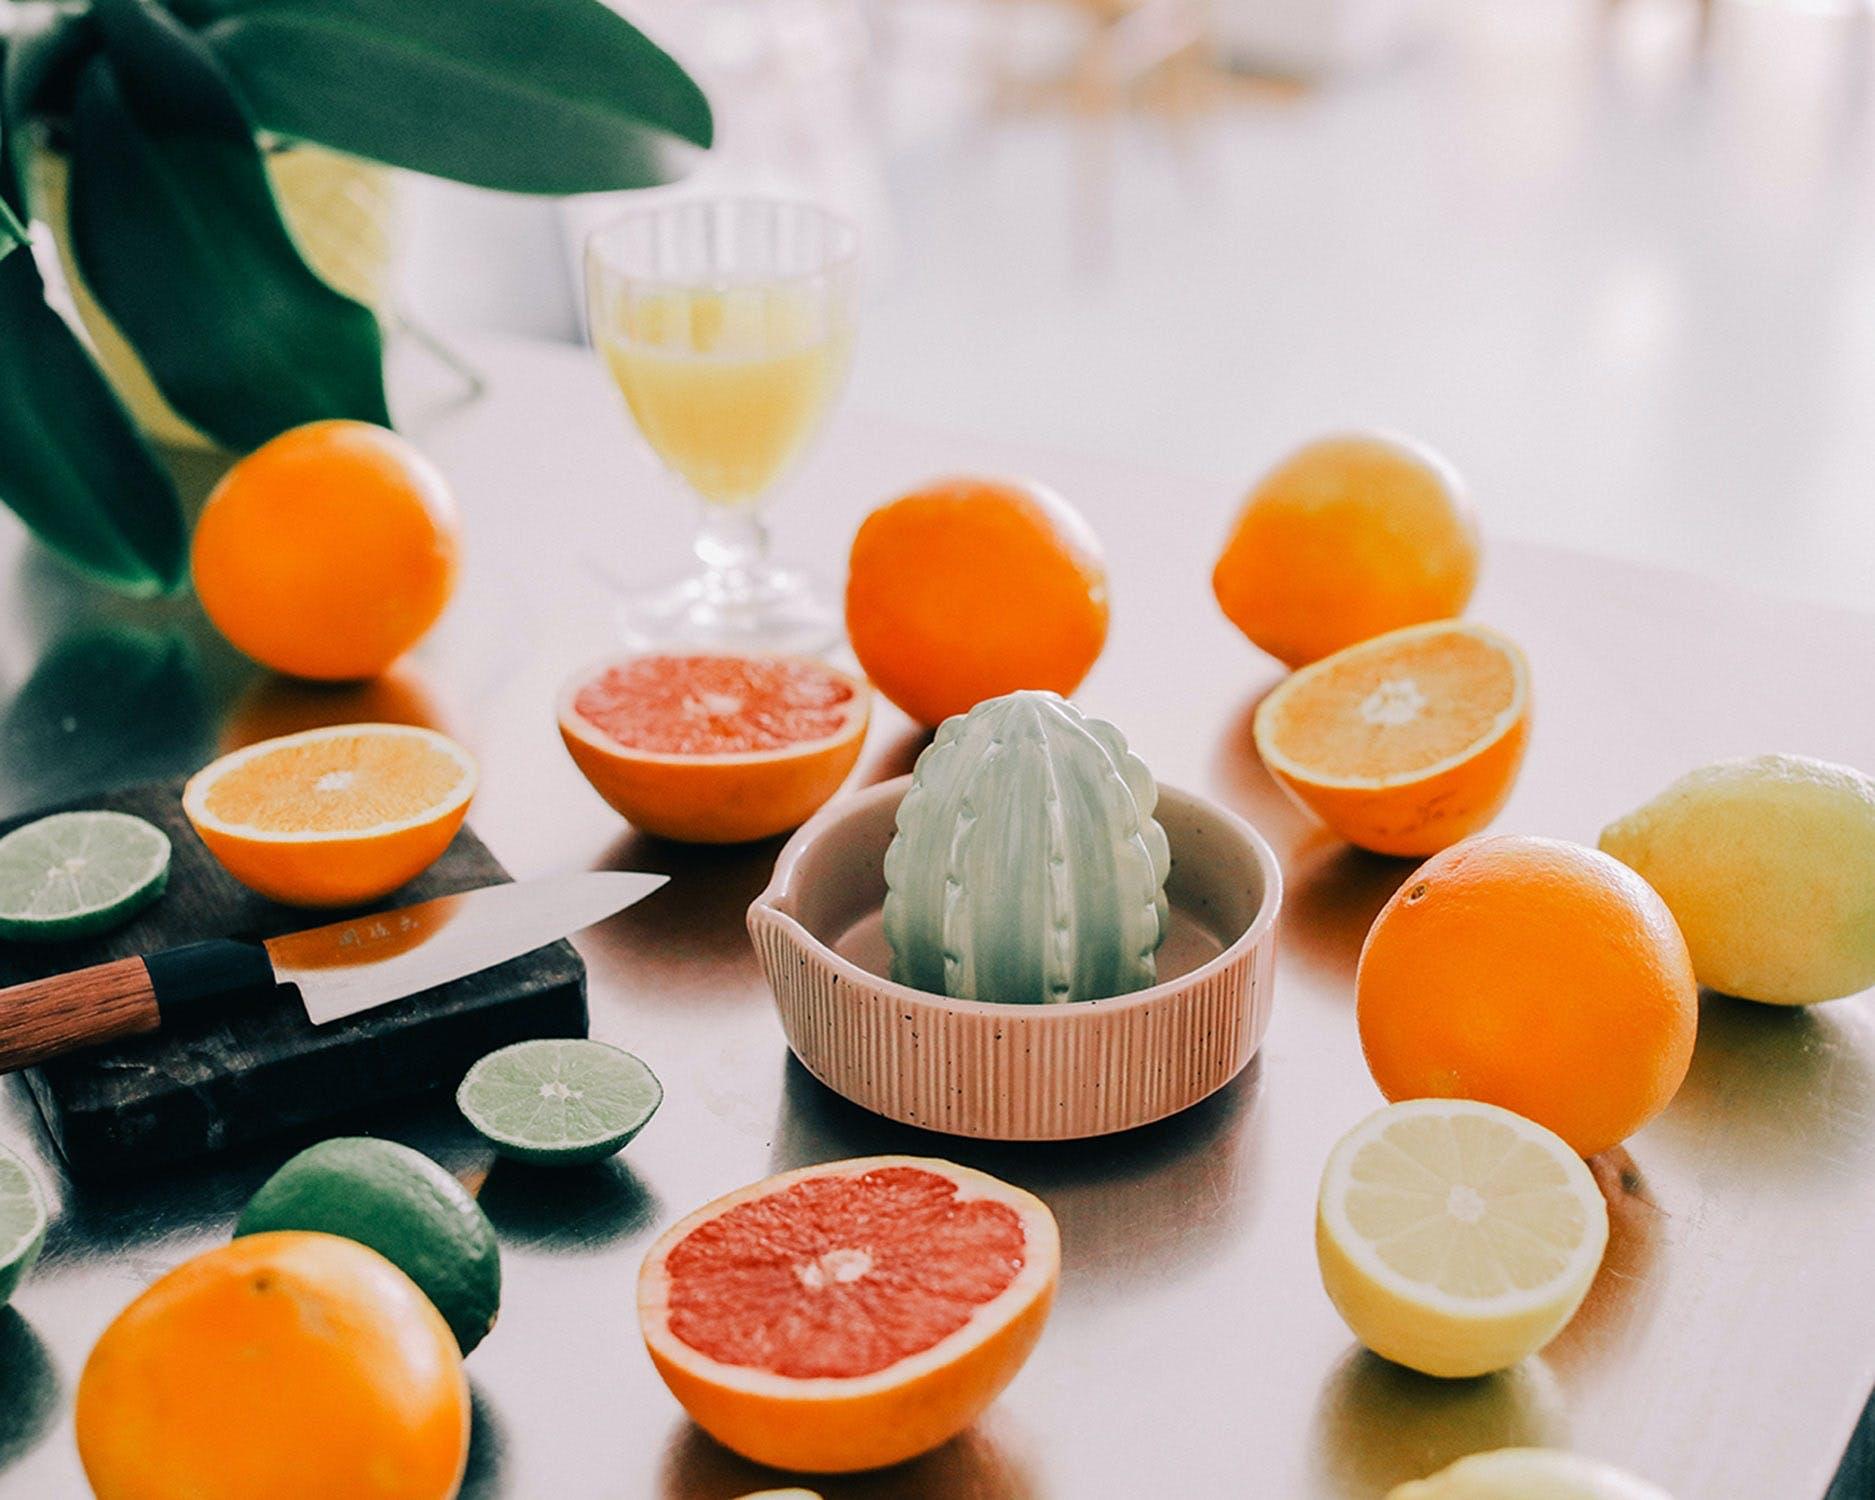 Finurlig citruspresser